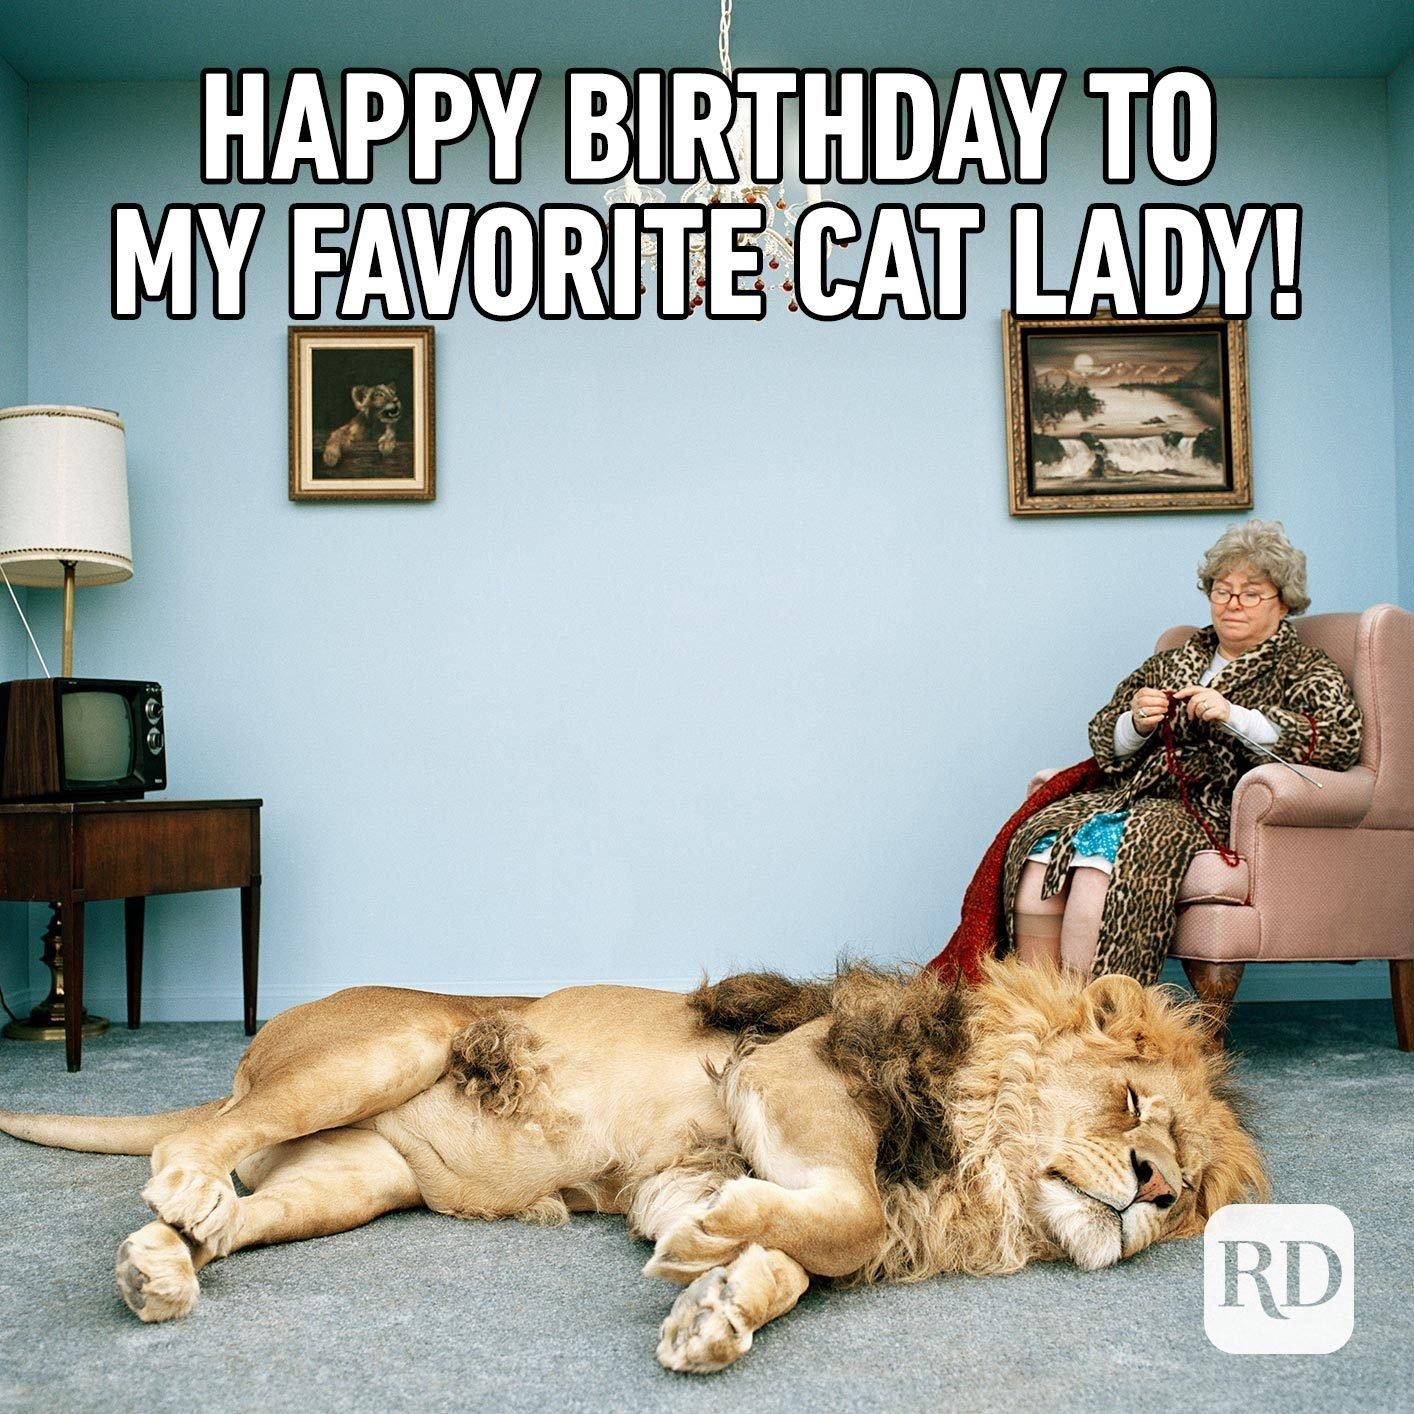 Happy Birthday to my favorite cat lady!